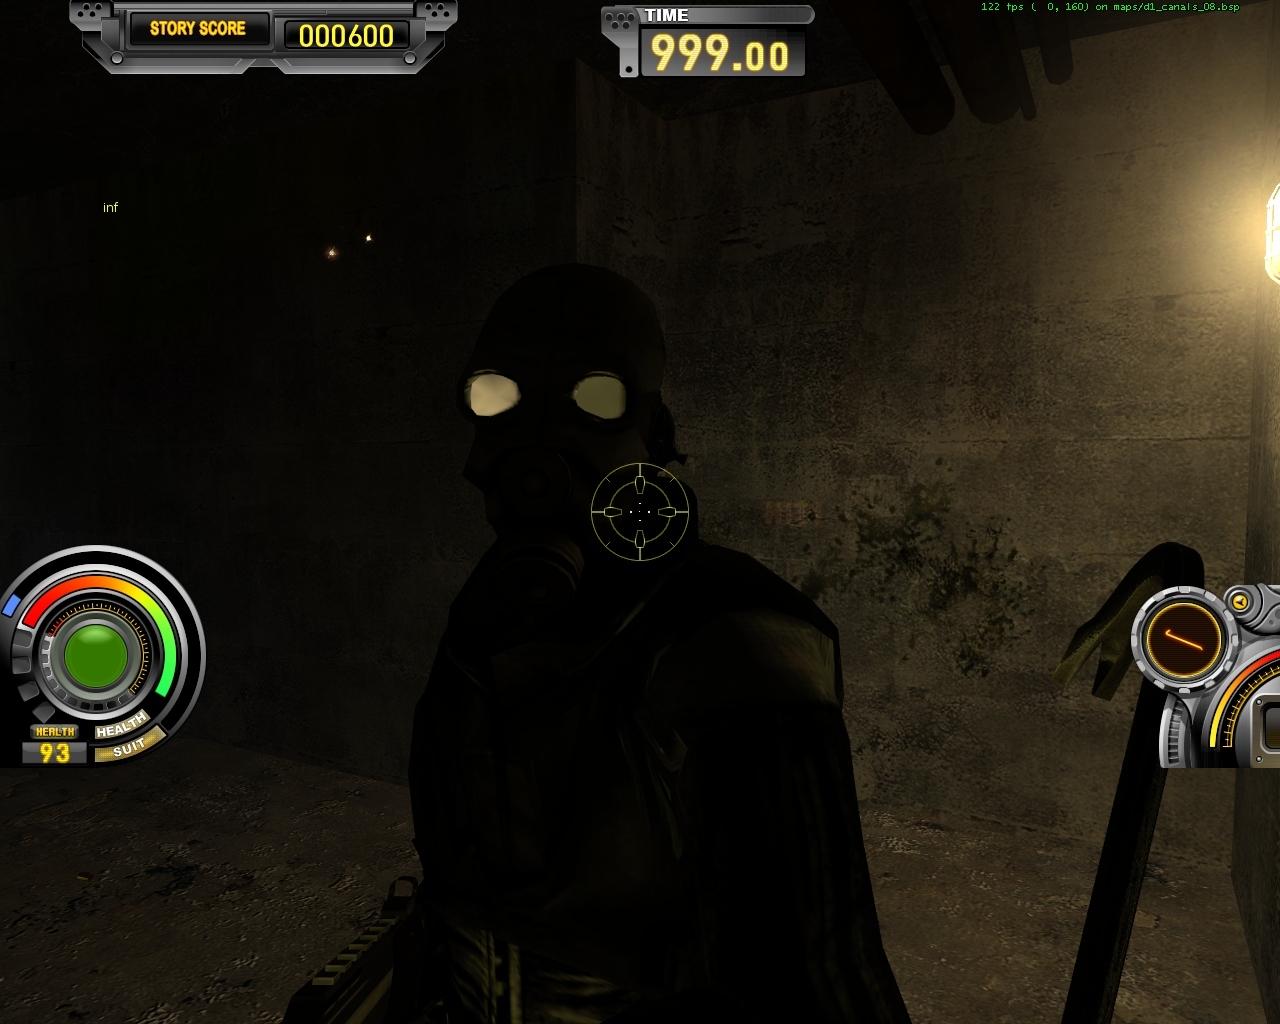 Дартошник - Half-Life 2 Half-Life 2 Survivor, HL2Survivor